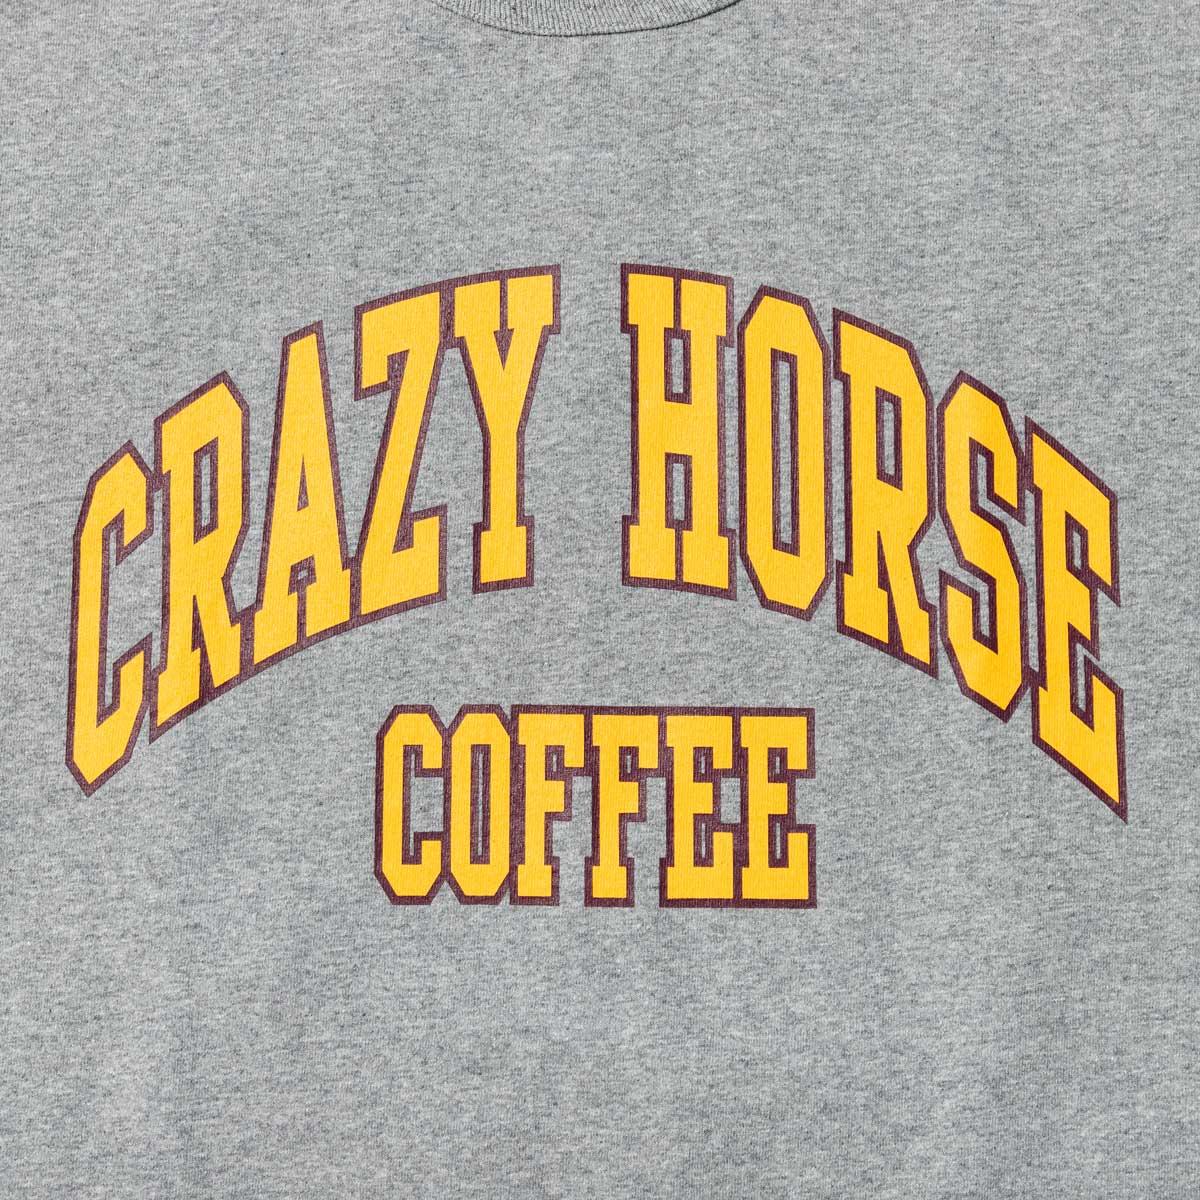 CRAZY HORSE COFFEE TEE designed by Shuntaro Watanabe